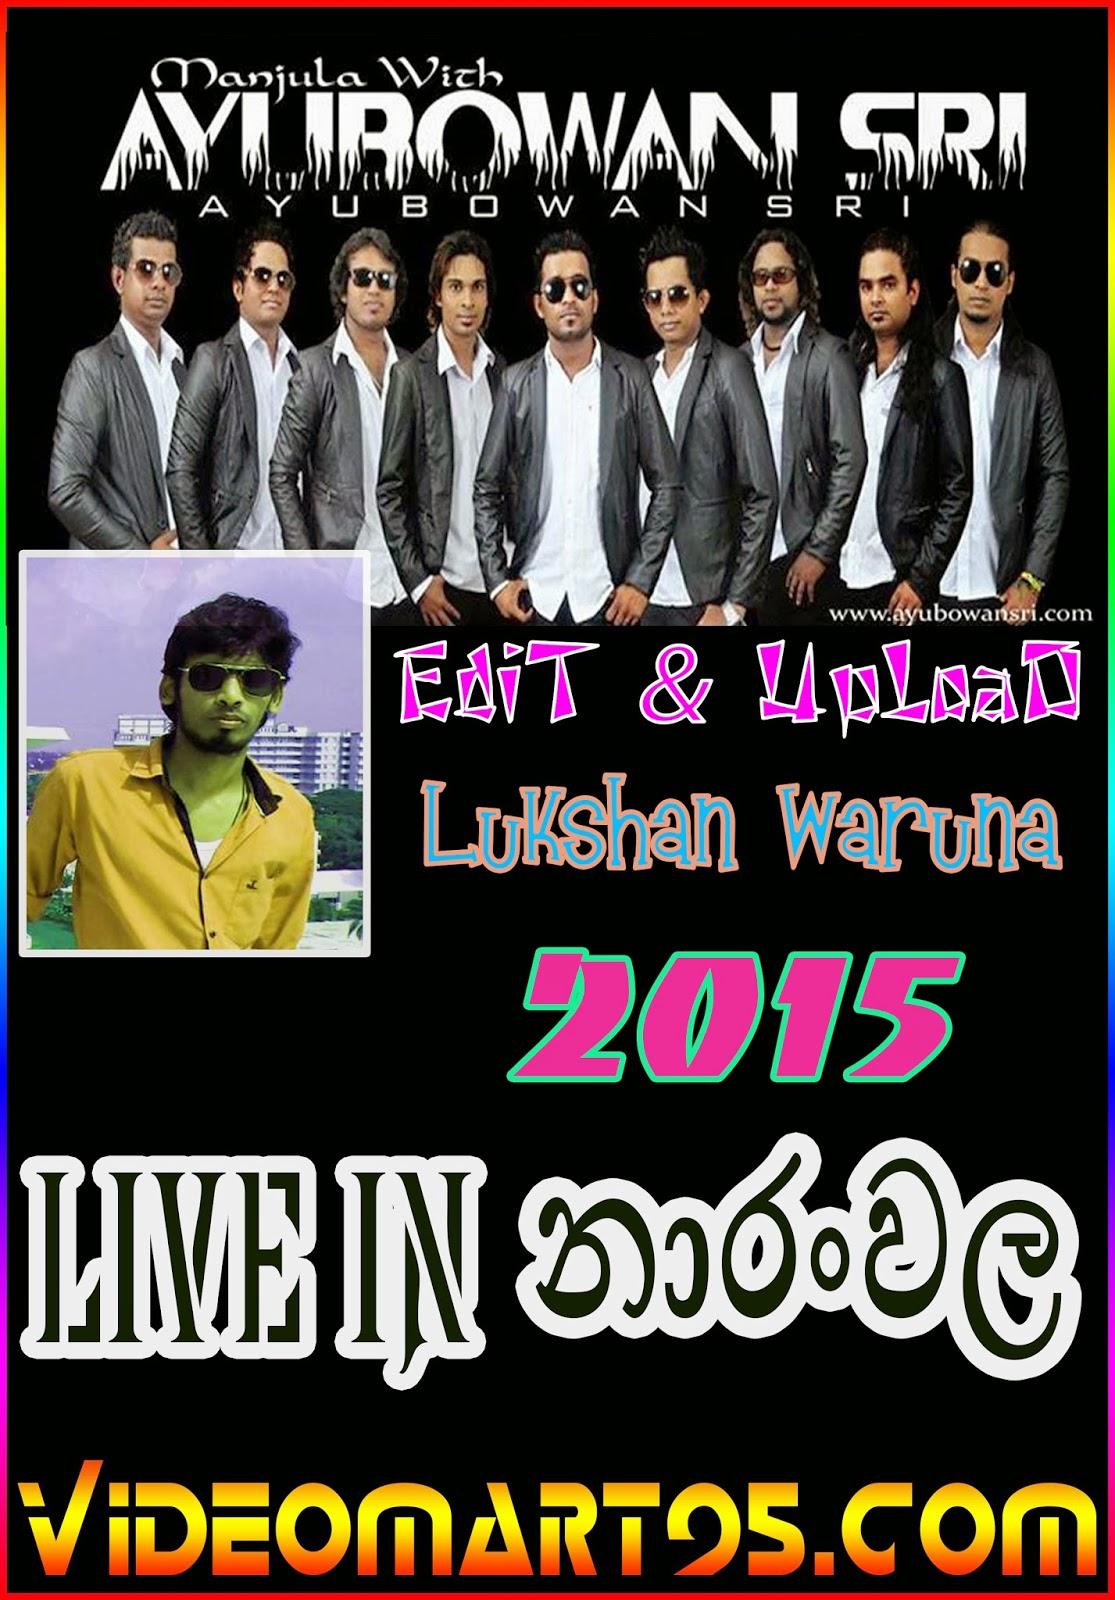 AYUBOWAN SRI LIVE NAARANWALA 2015